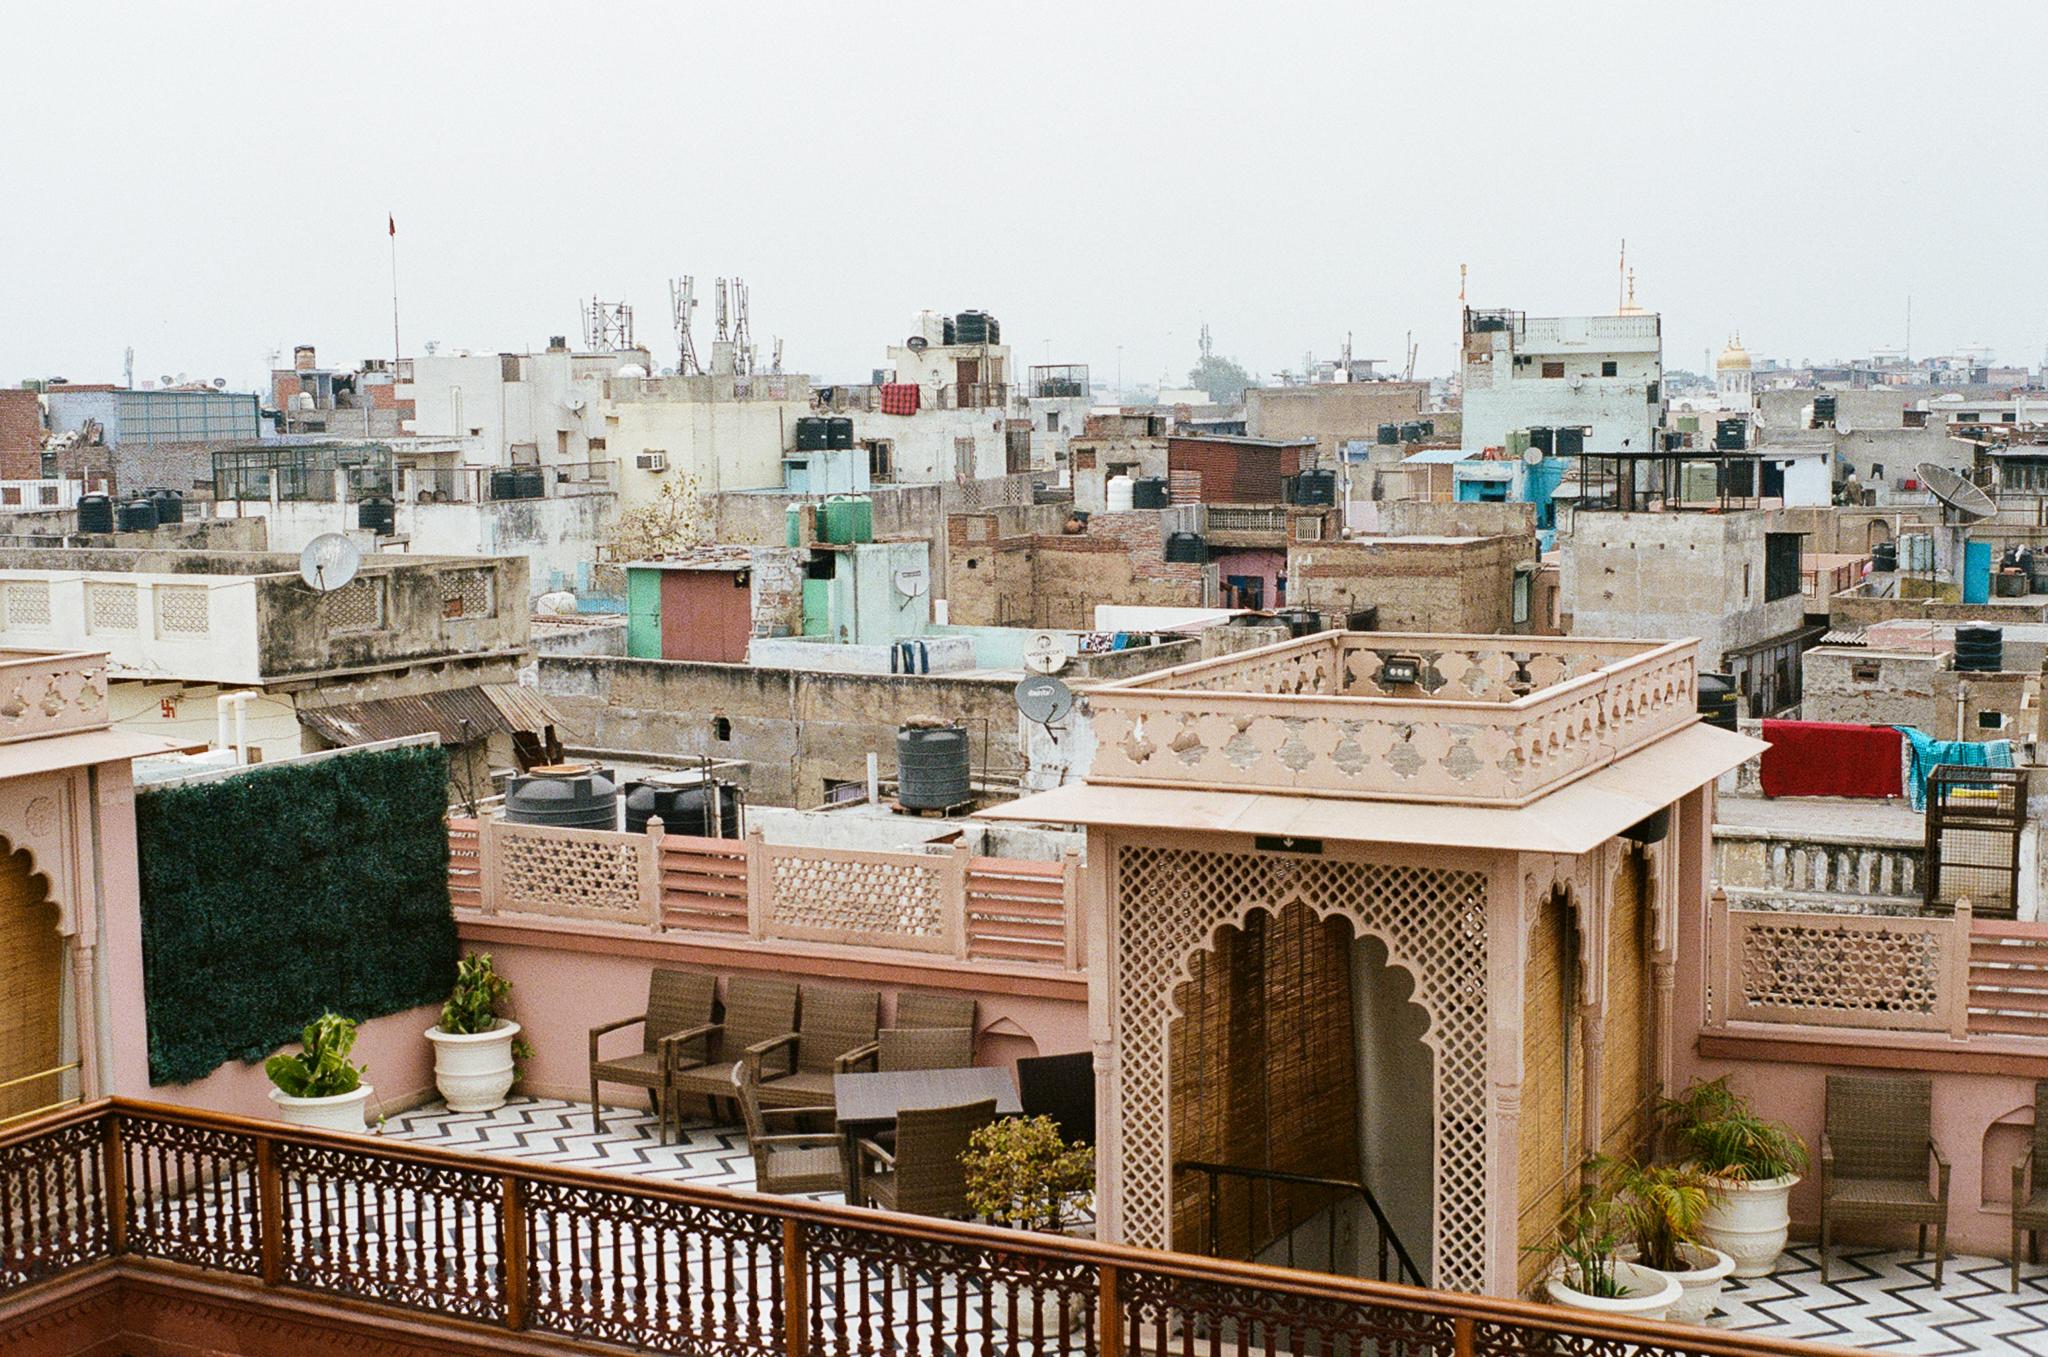 Delhi India India Travel Street Photography (2 of 2).jpg